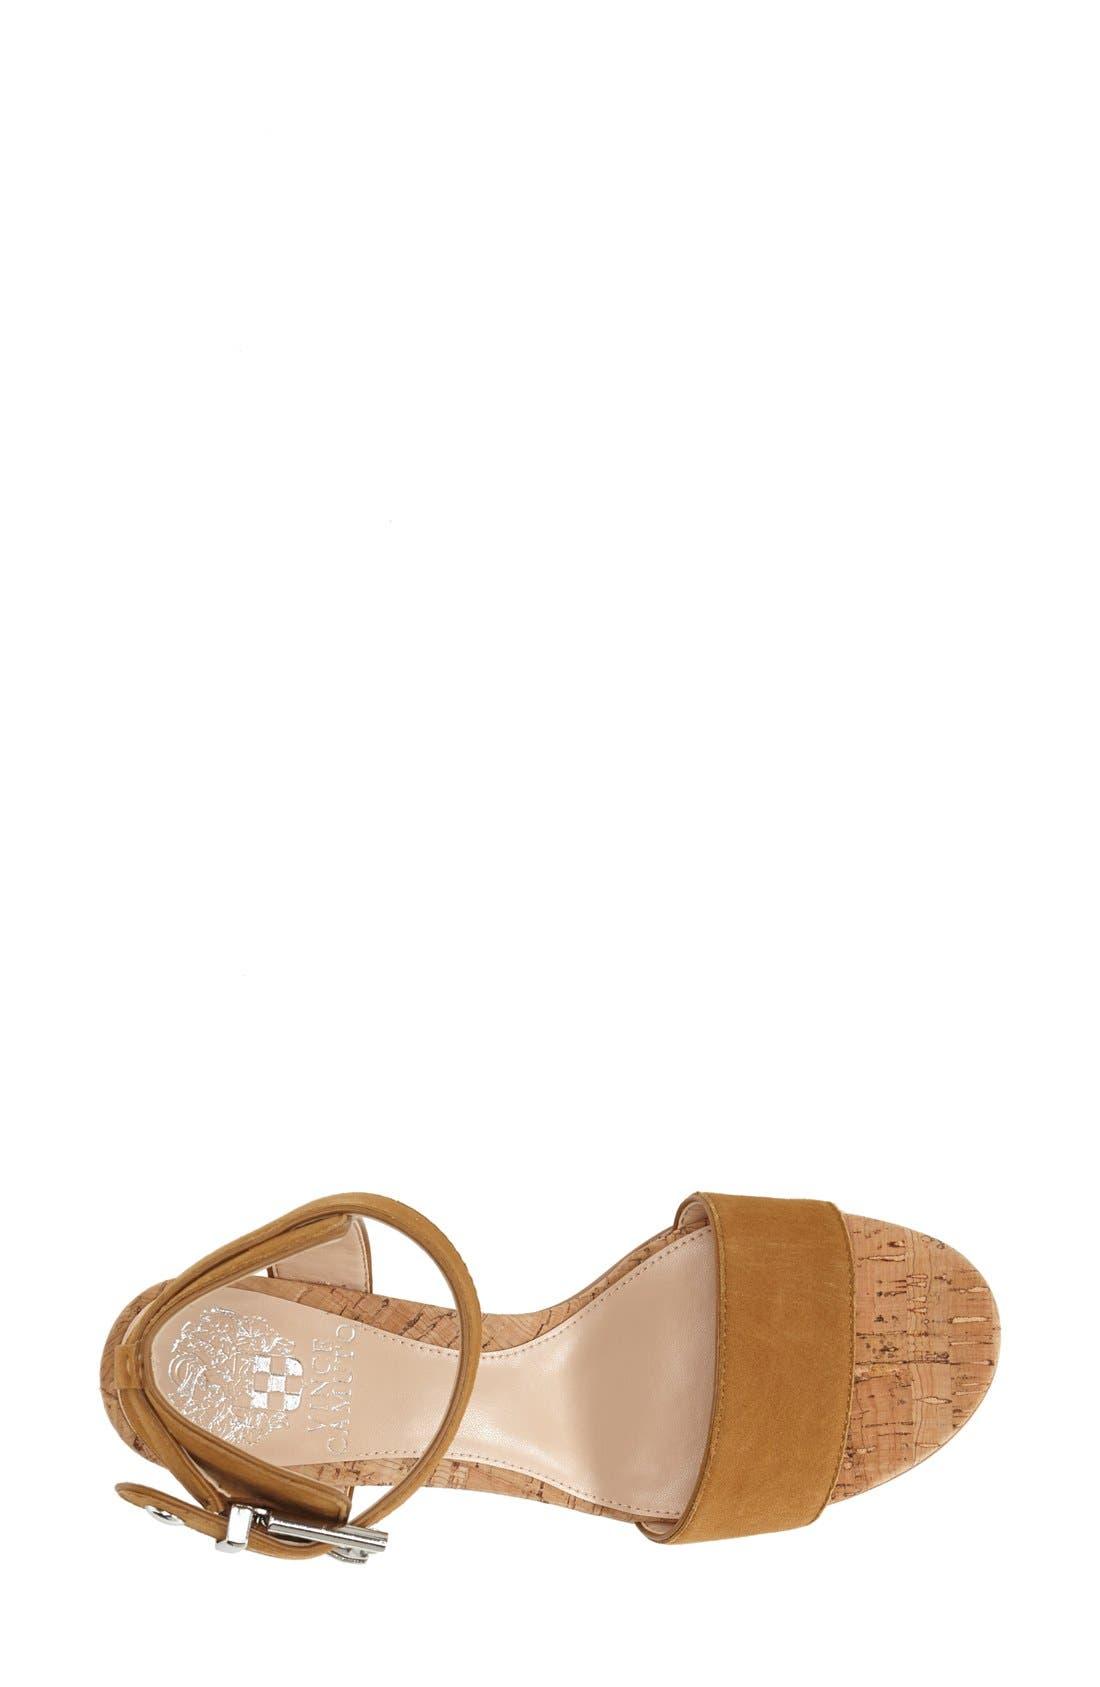 Alternate Image 3  - Vince Camuto 'Baeden' Sandal (Women)